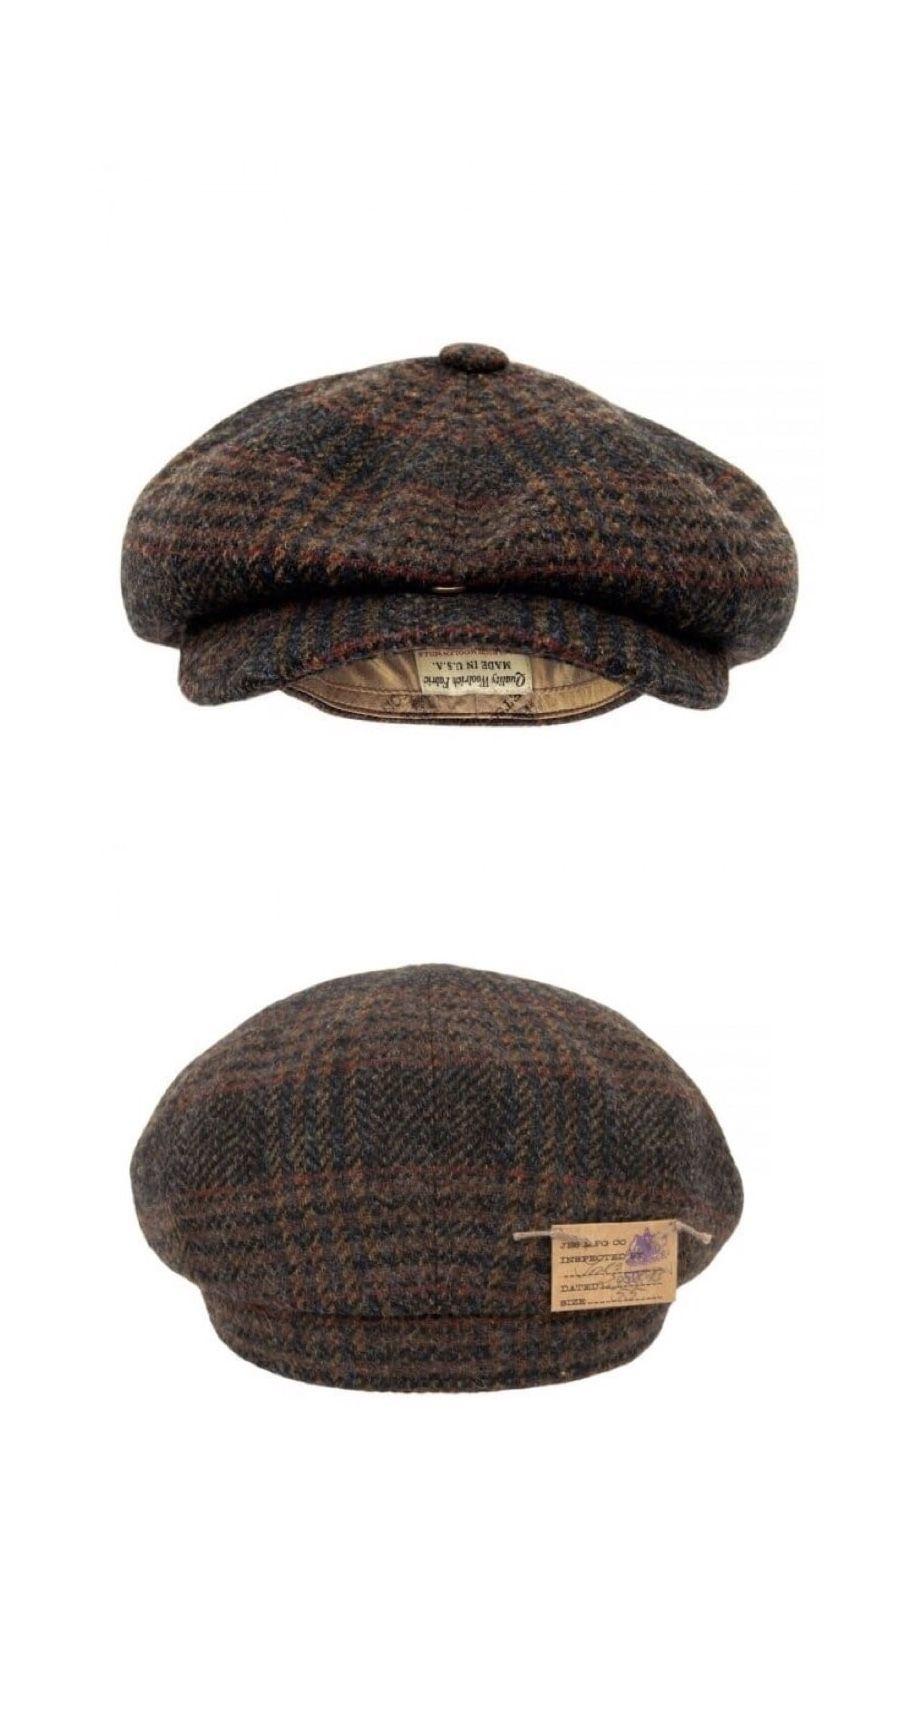 73c31620b Stetson Hat- wool cap $99.00 Brown #menswear #hat | MEN ACCESSORIES ...